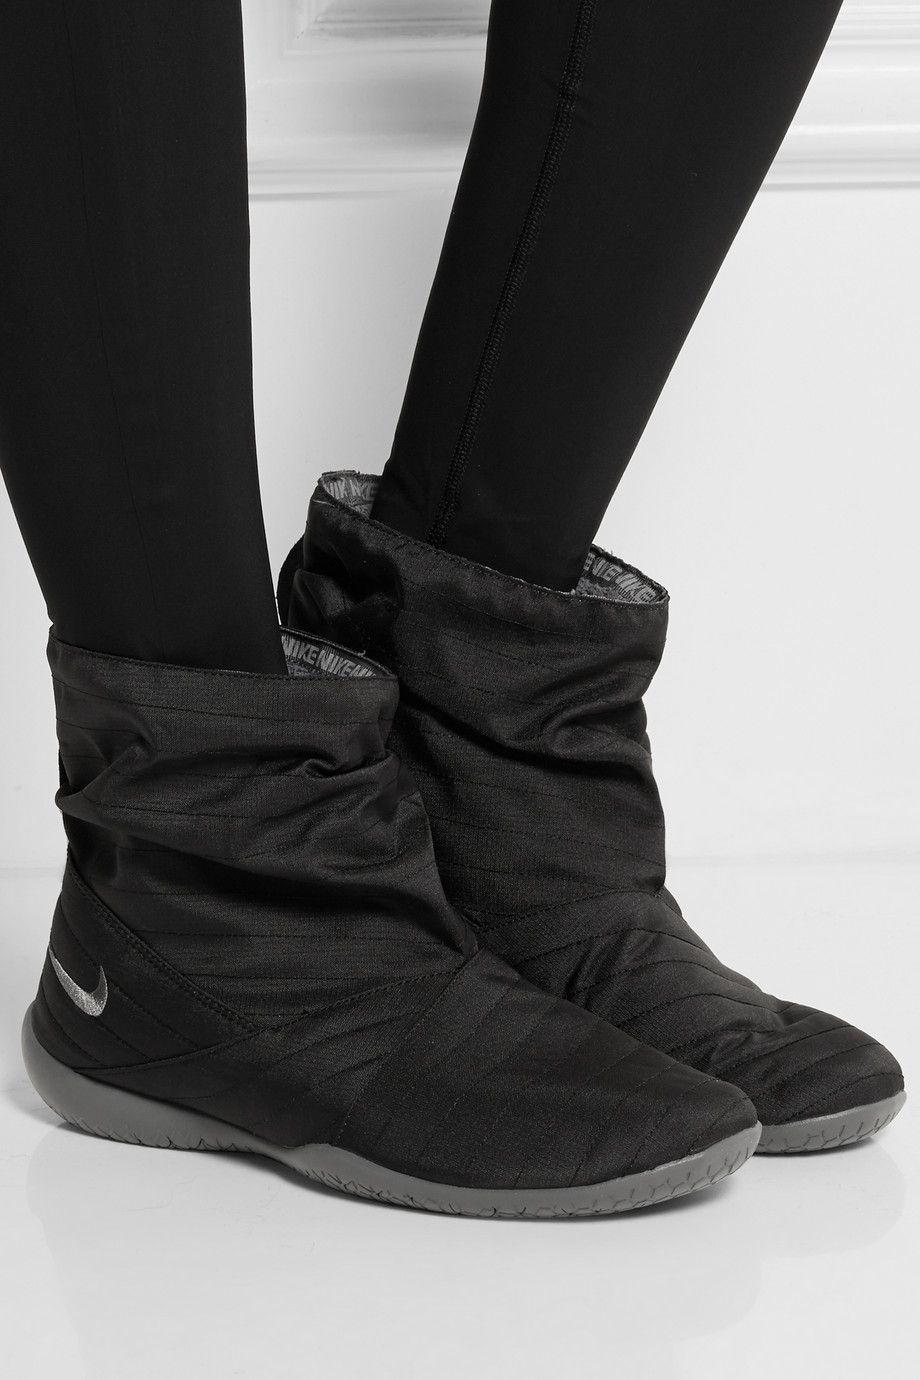 Nike Studio Mid Pack yoga shoe and outdoor boot NETA